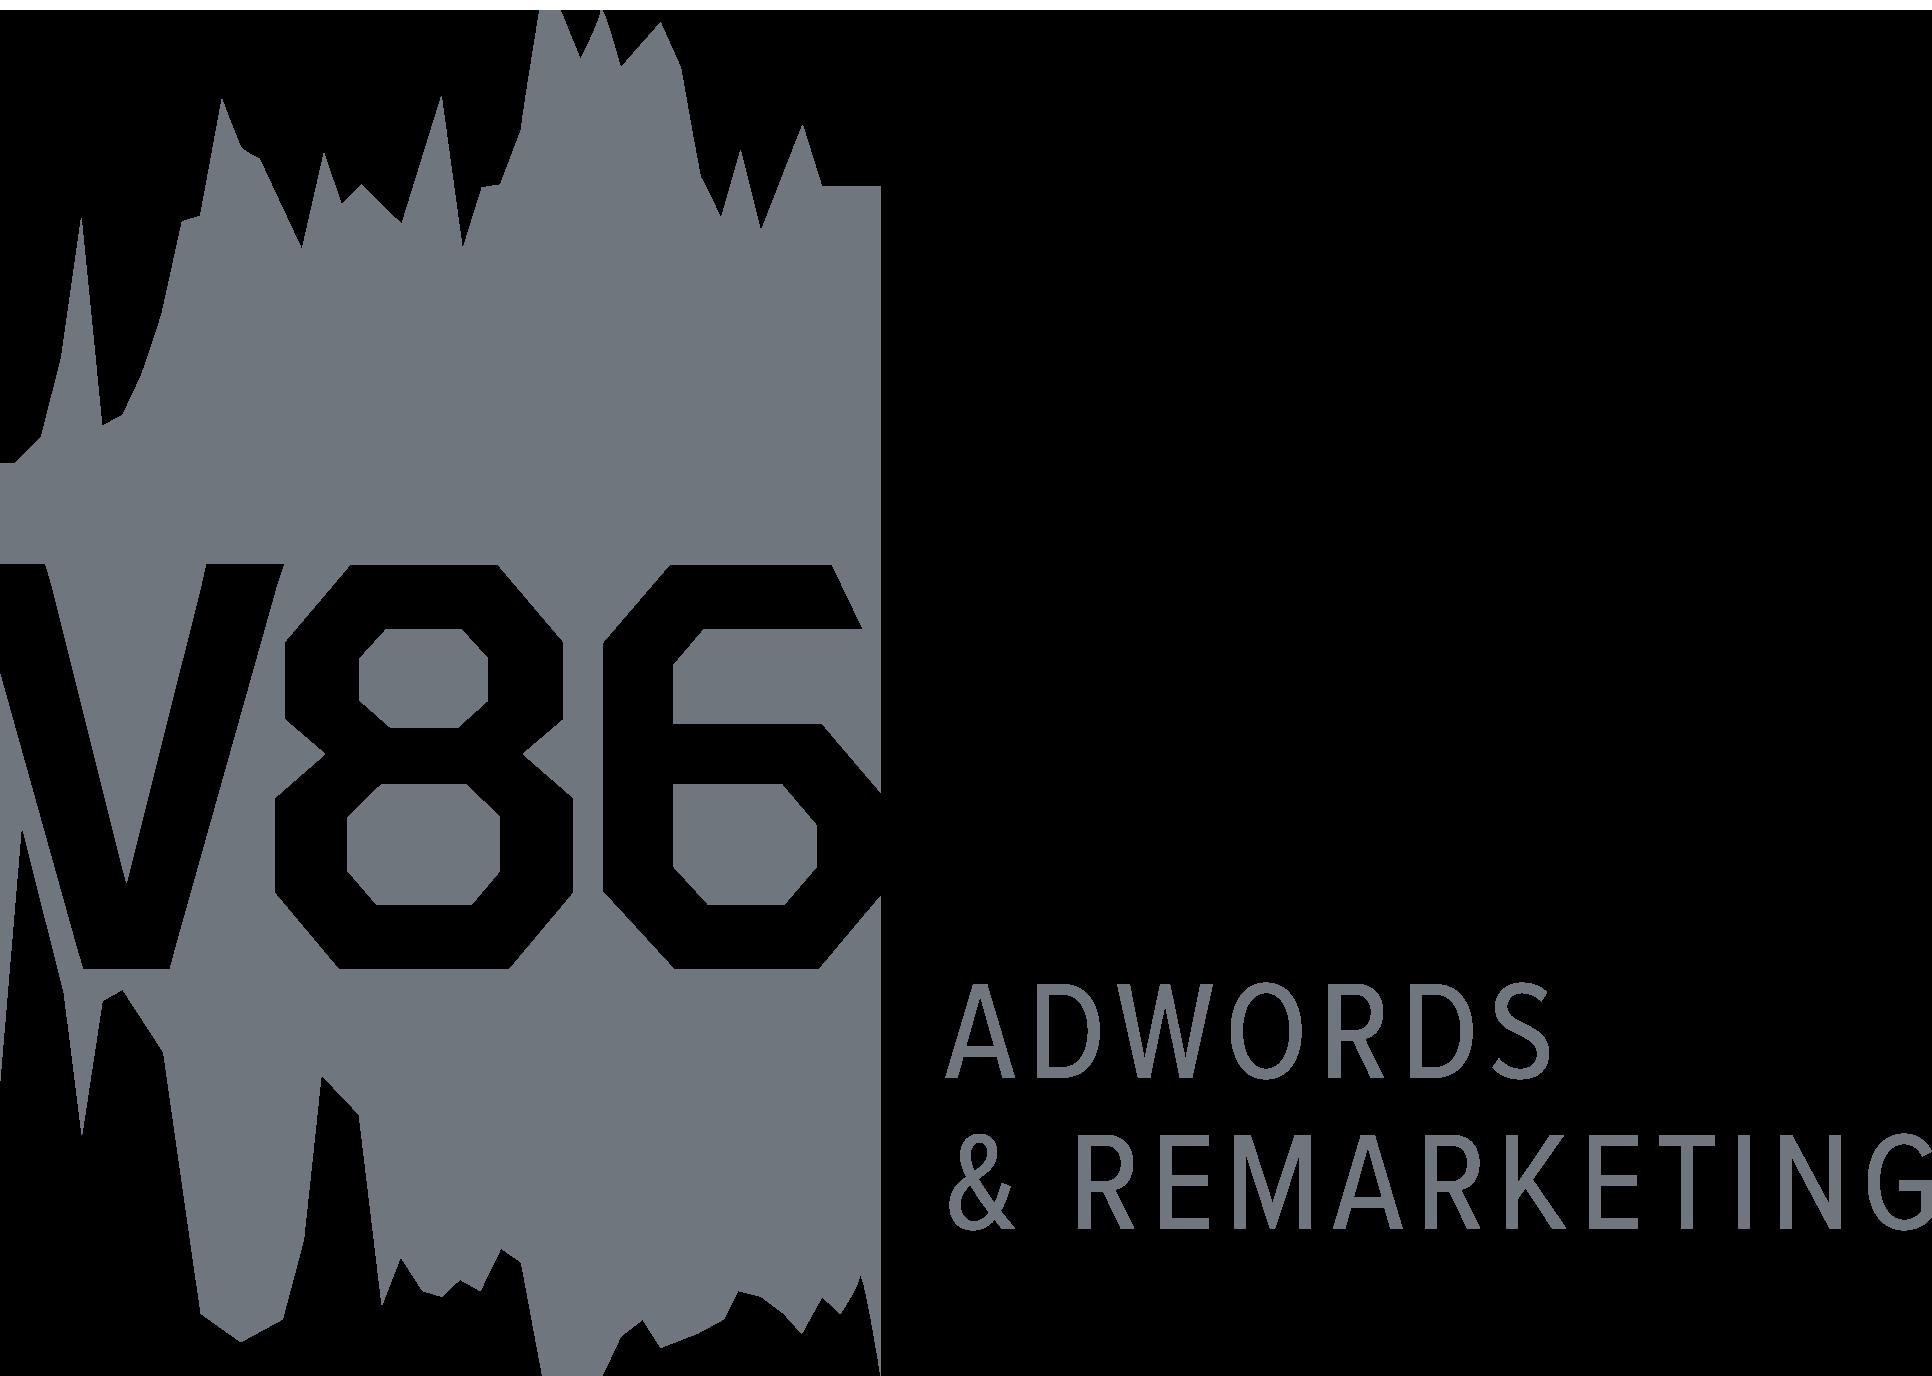 V86-Adwords-Remarketing.png